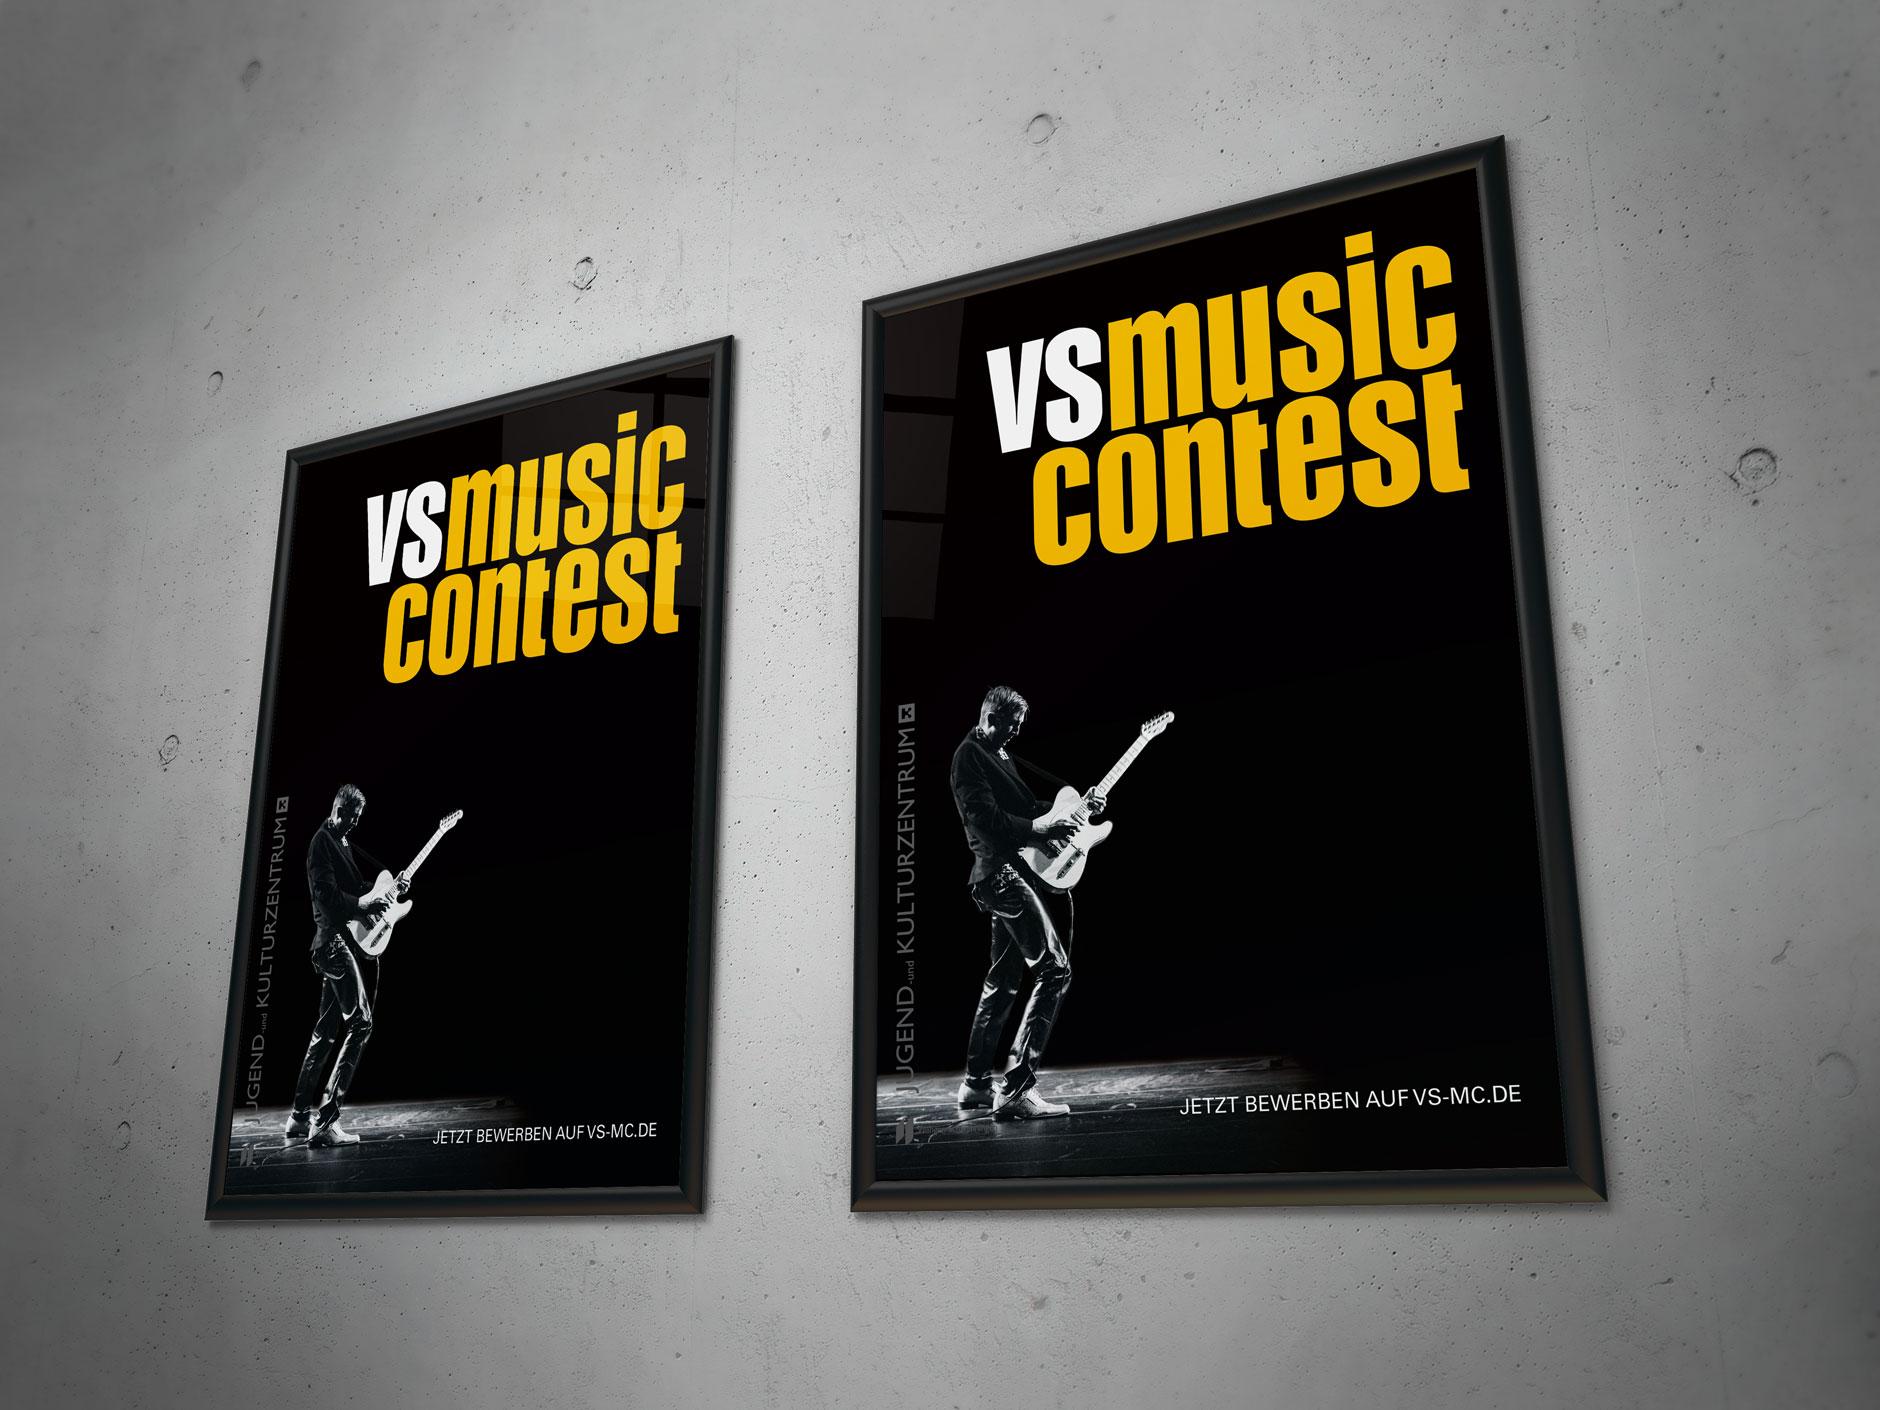 plakatgestaltung vs music contest-Plakatgestaltung VS MUSIC CONTEST